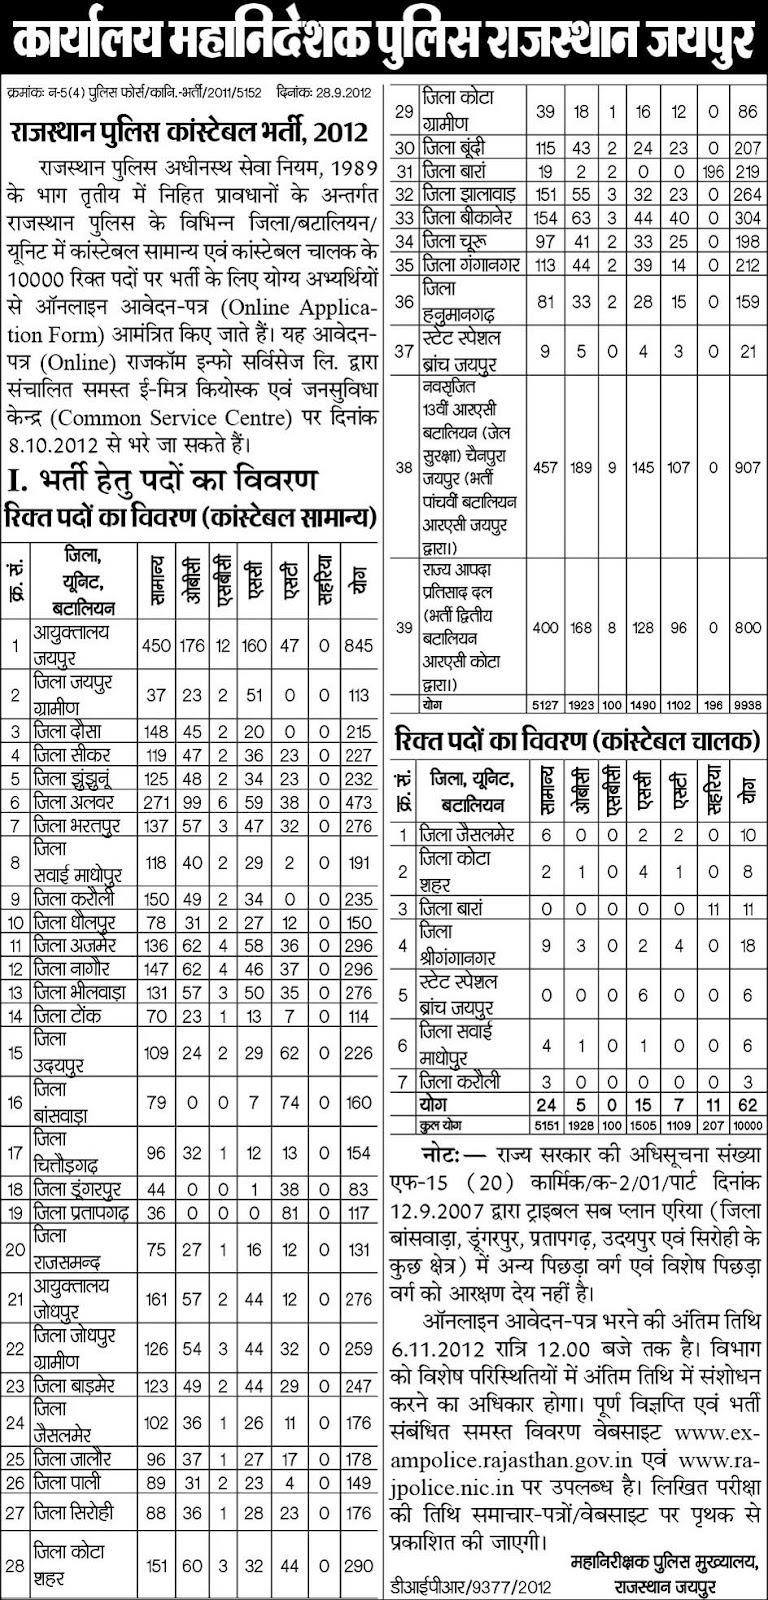 Hsbc recruitment 2014 in india - hsbc recruitment 2014 in india